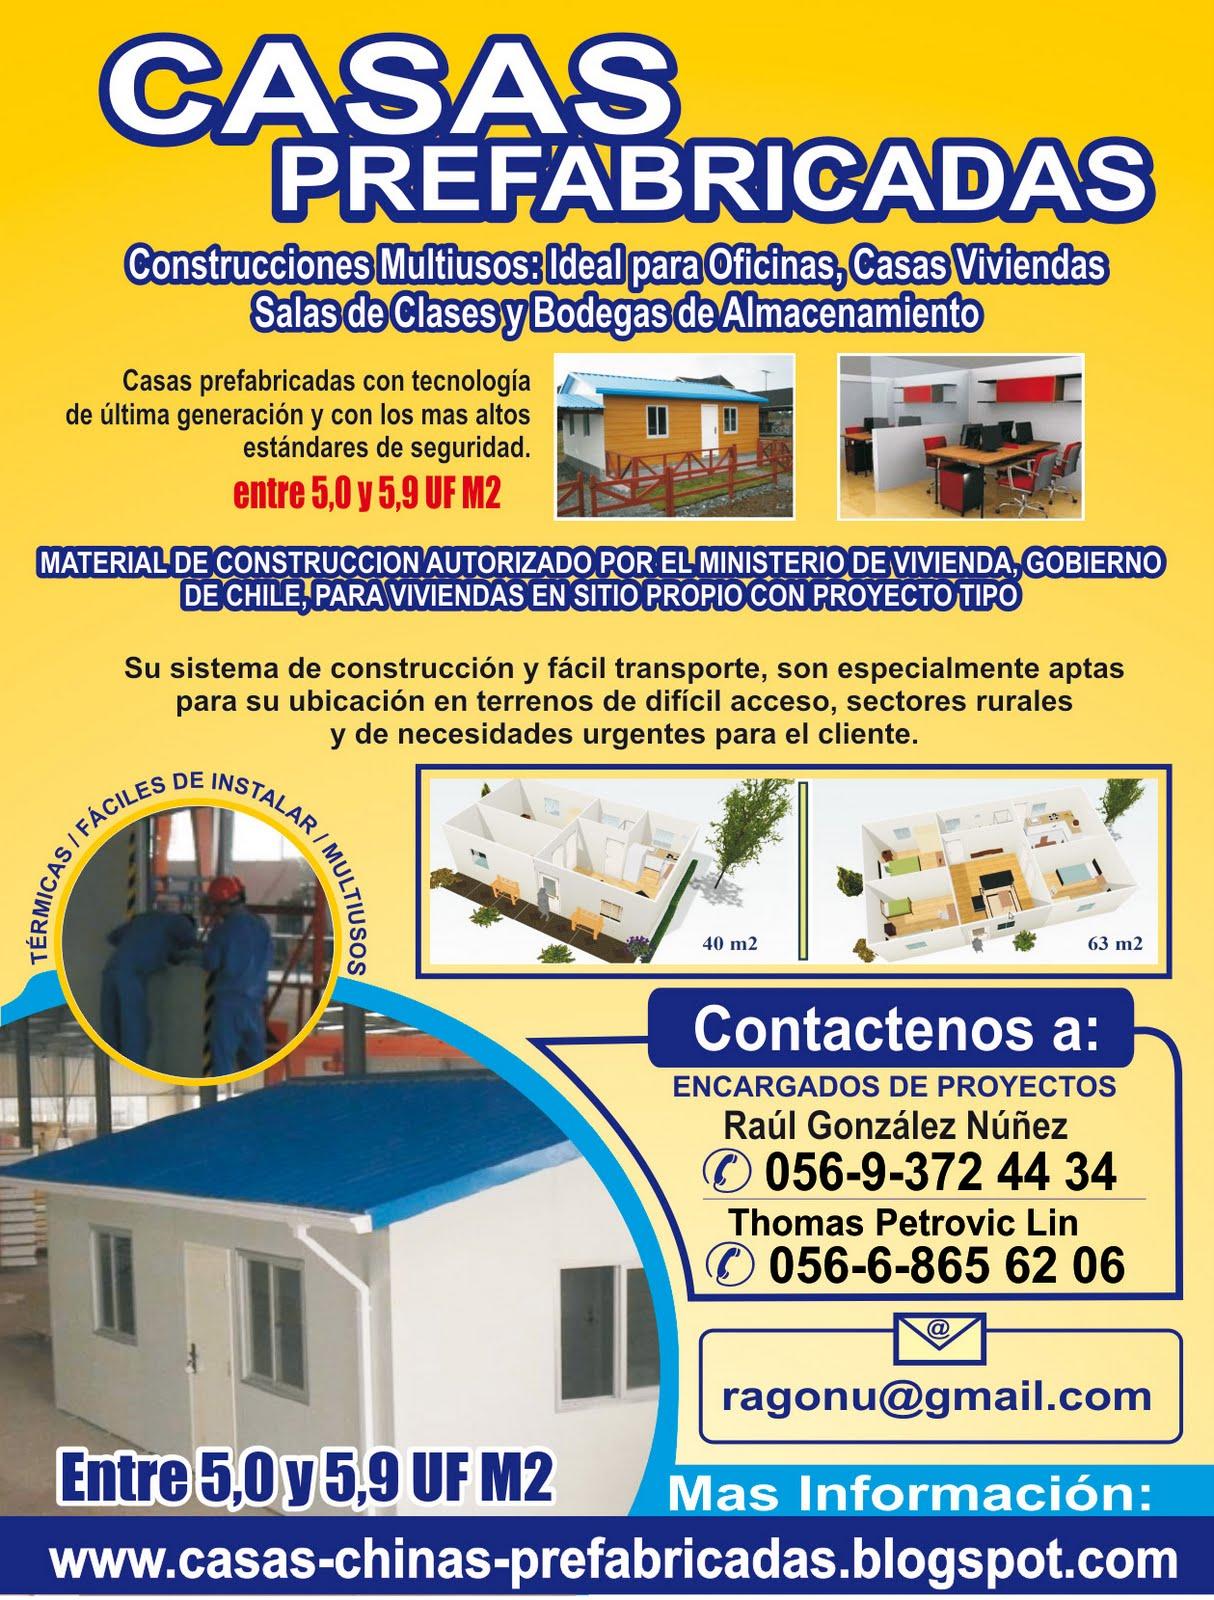 Casas lanco empresa constructora especialista en share - Empresa de casas prefabricadas ...